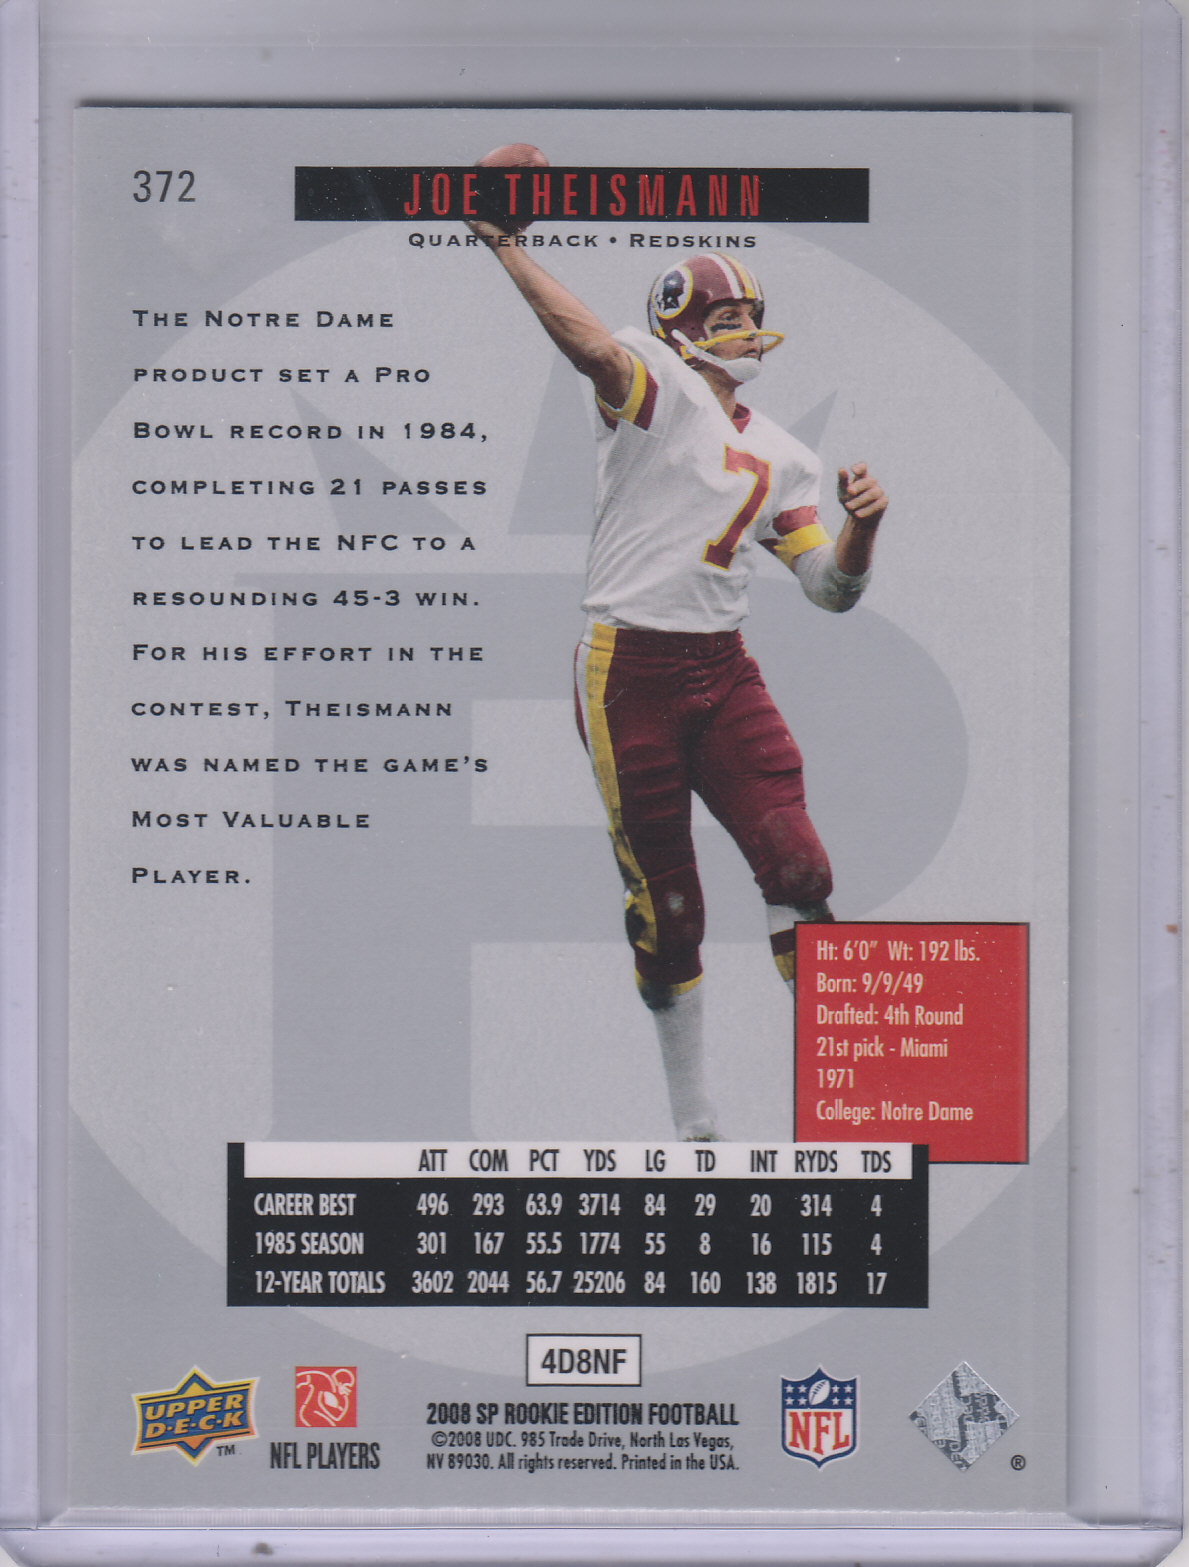 2008 SP Rookie Edition #372 Joe Theismann 96 back image